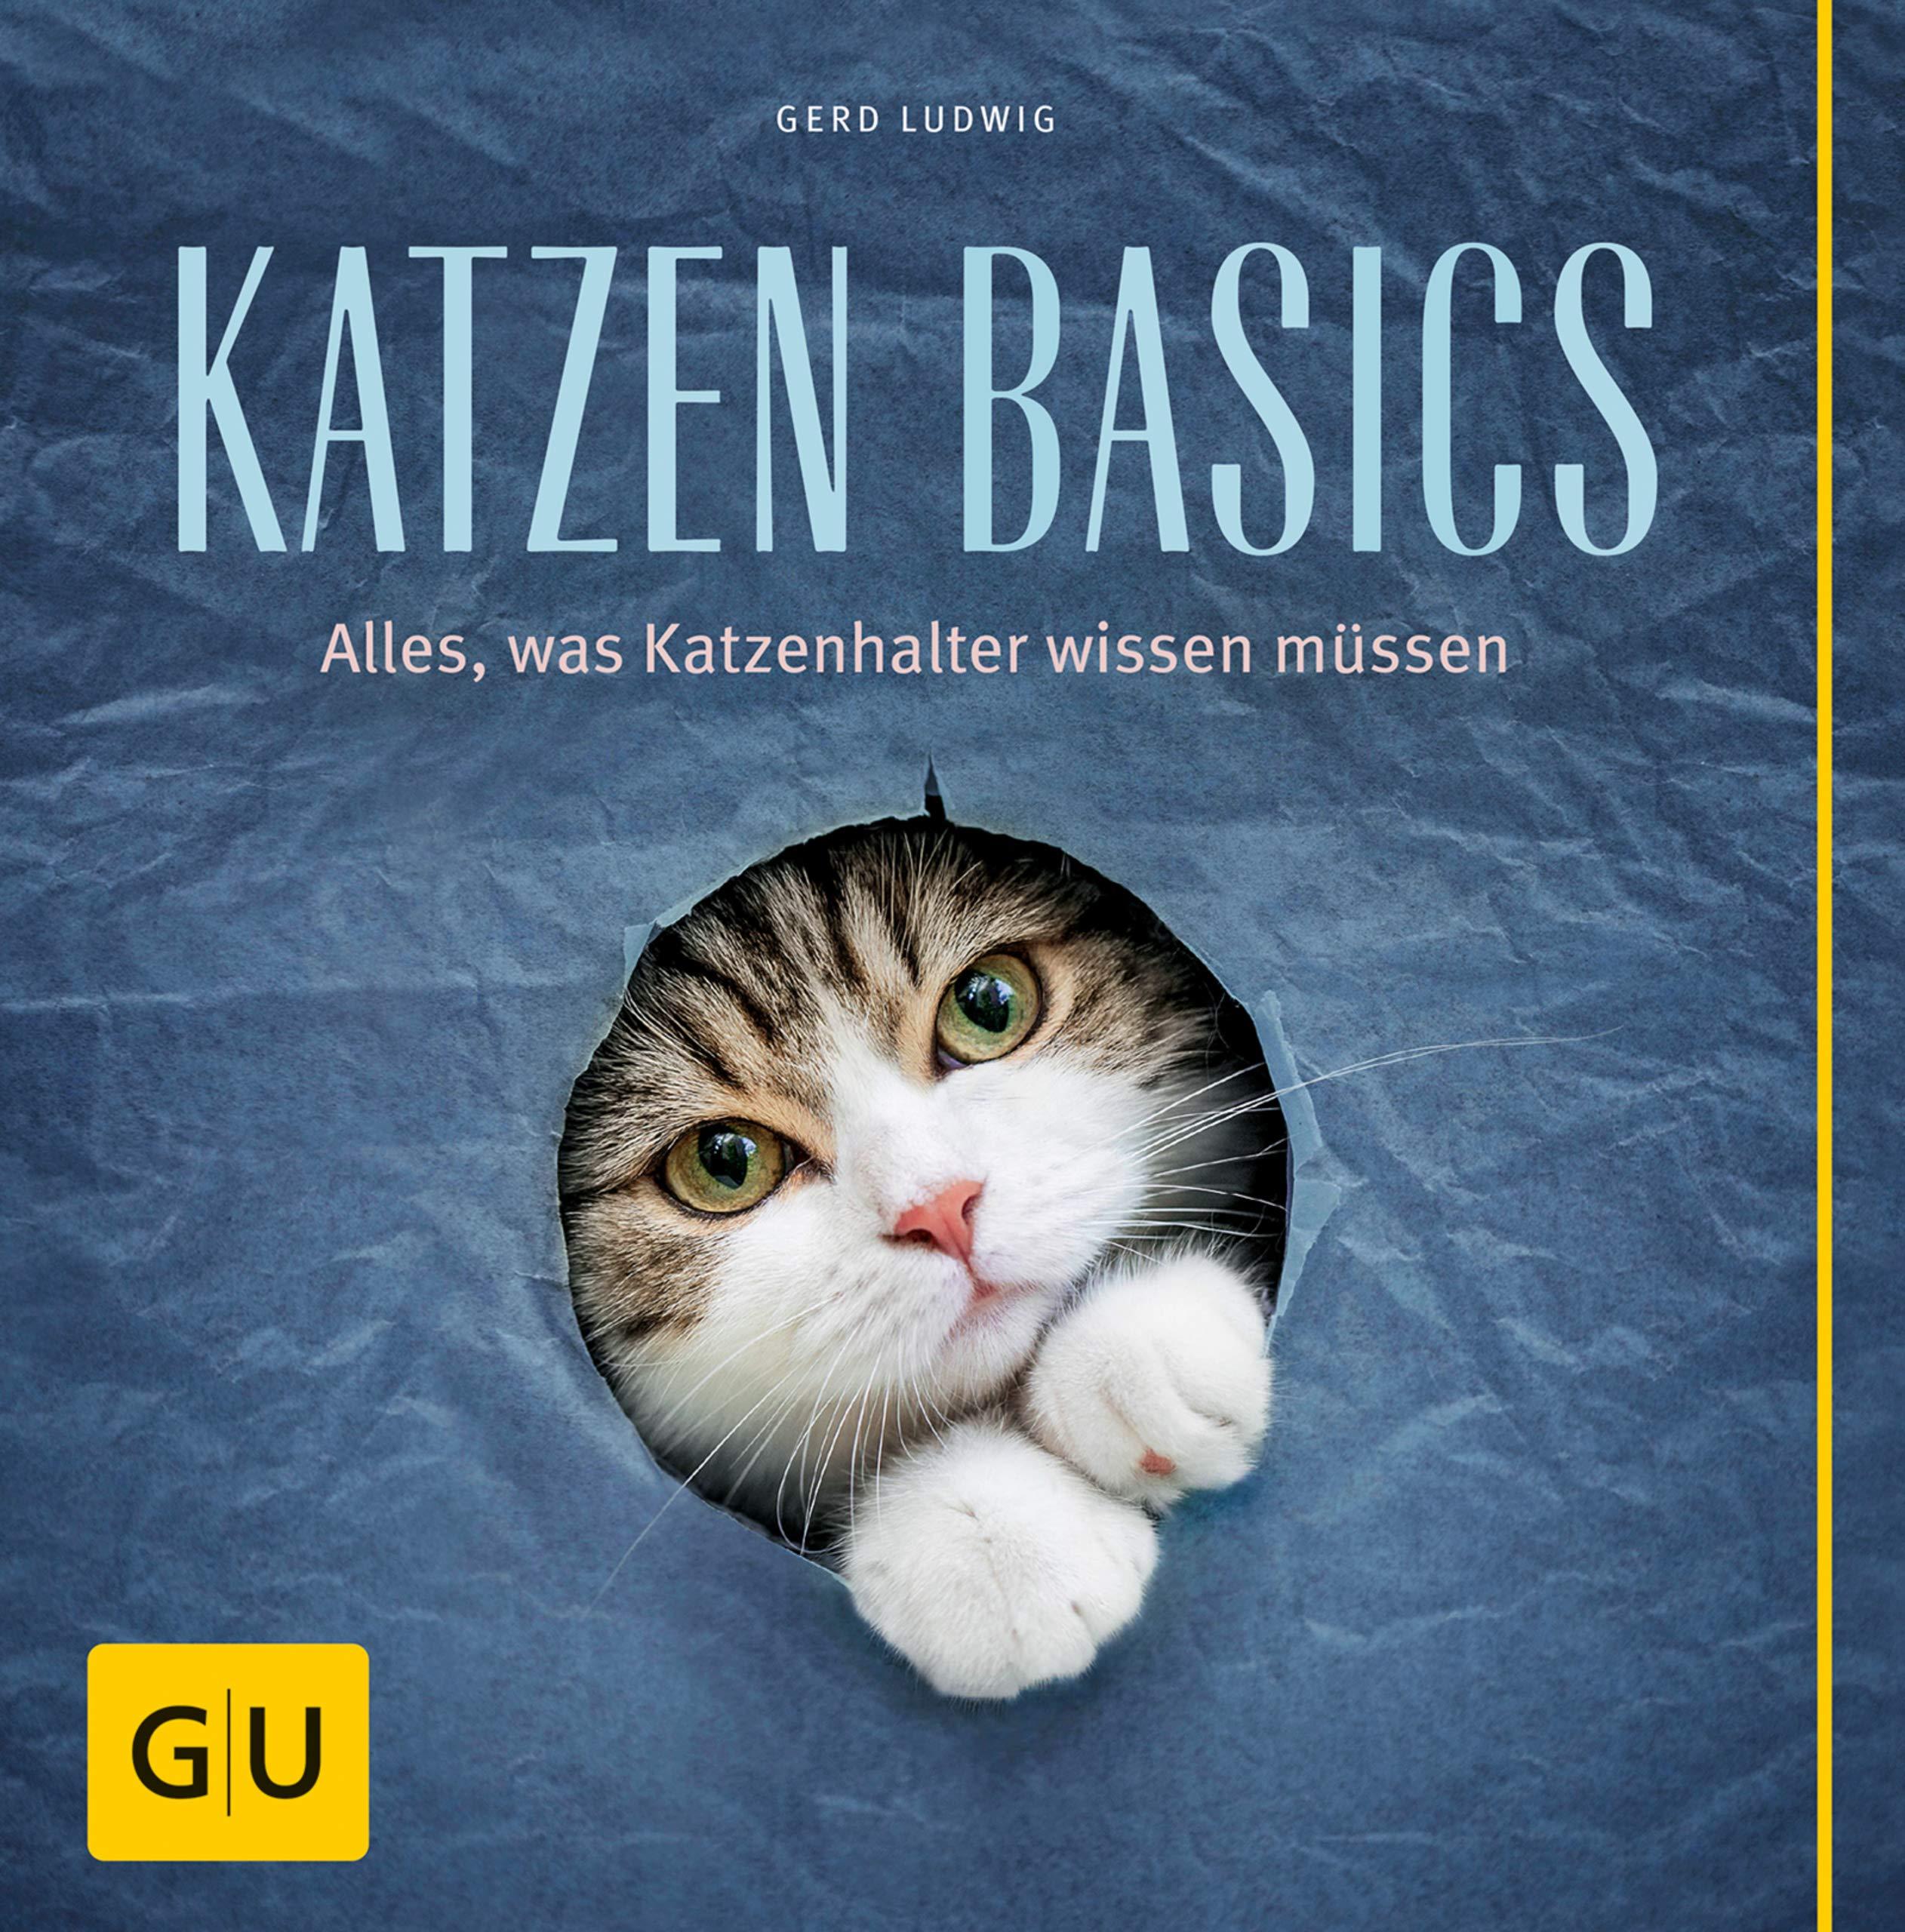 Katzen Basics  Alles Was Katzenhalter Wissen Müssen  GU Tier Spezial